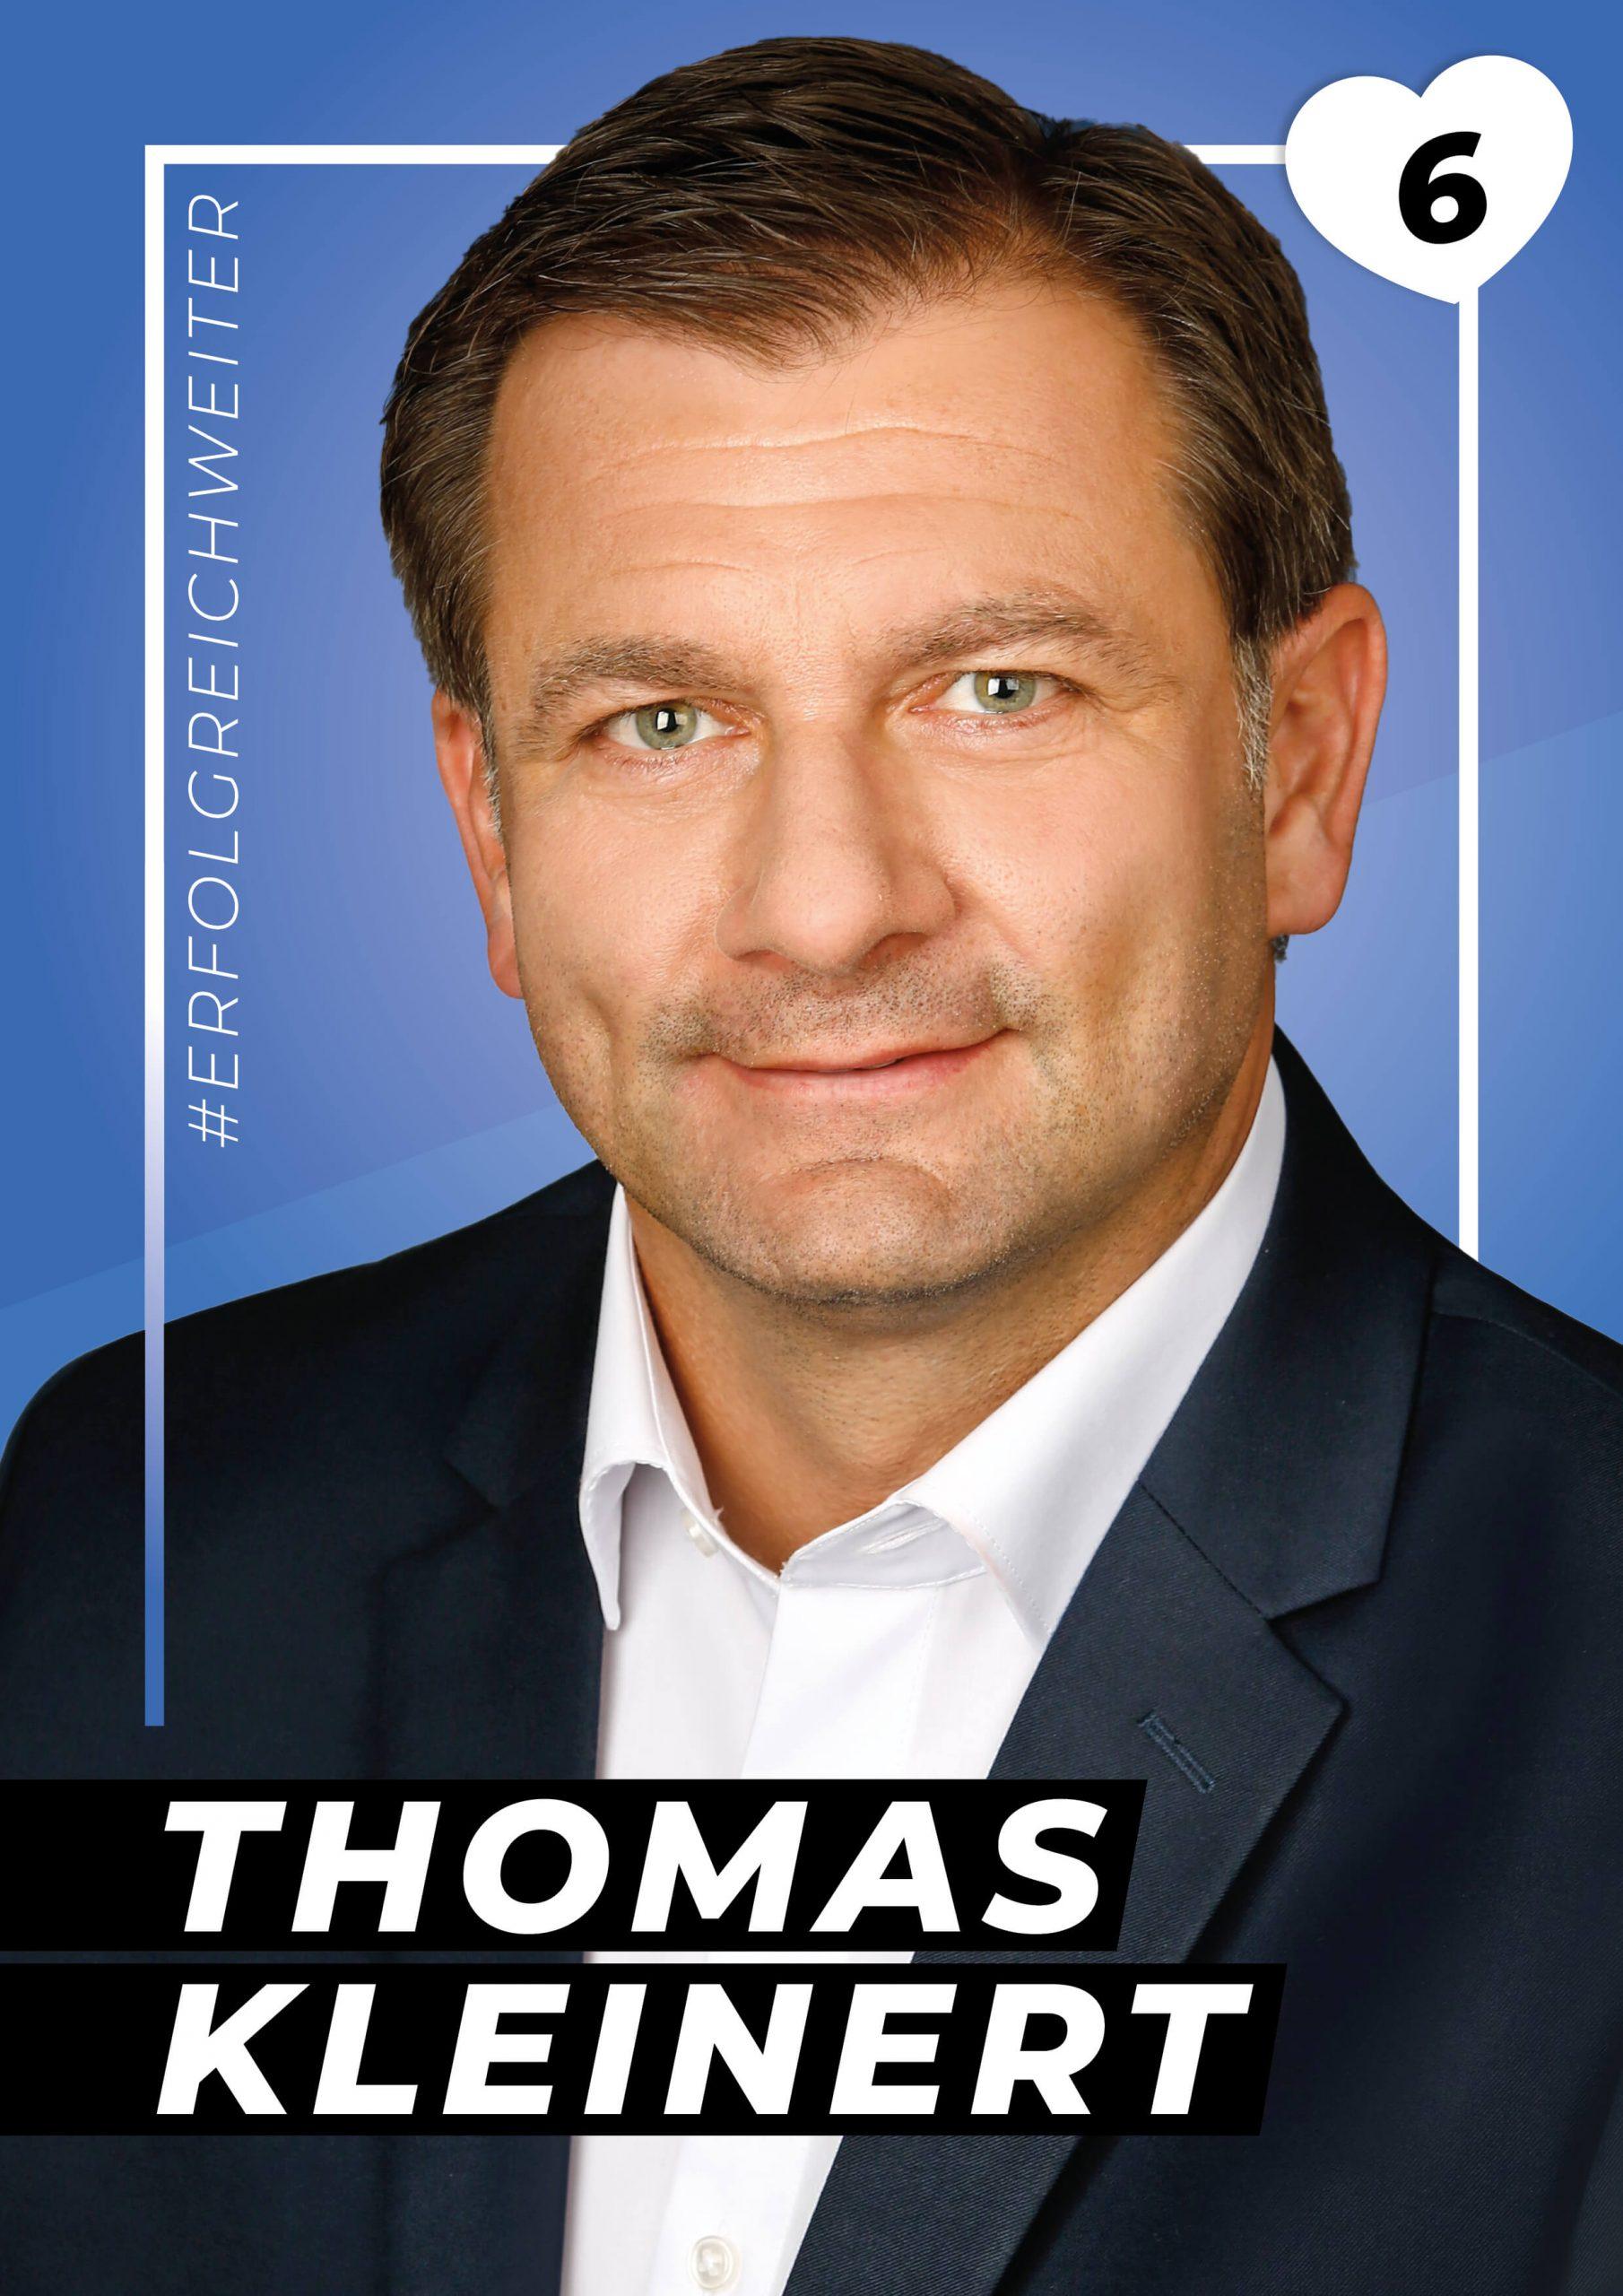 2019 Bürgerliste Köfering_Kandidaten6